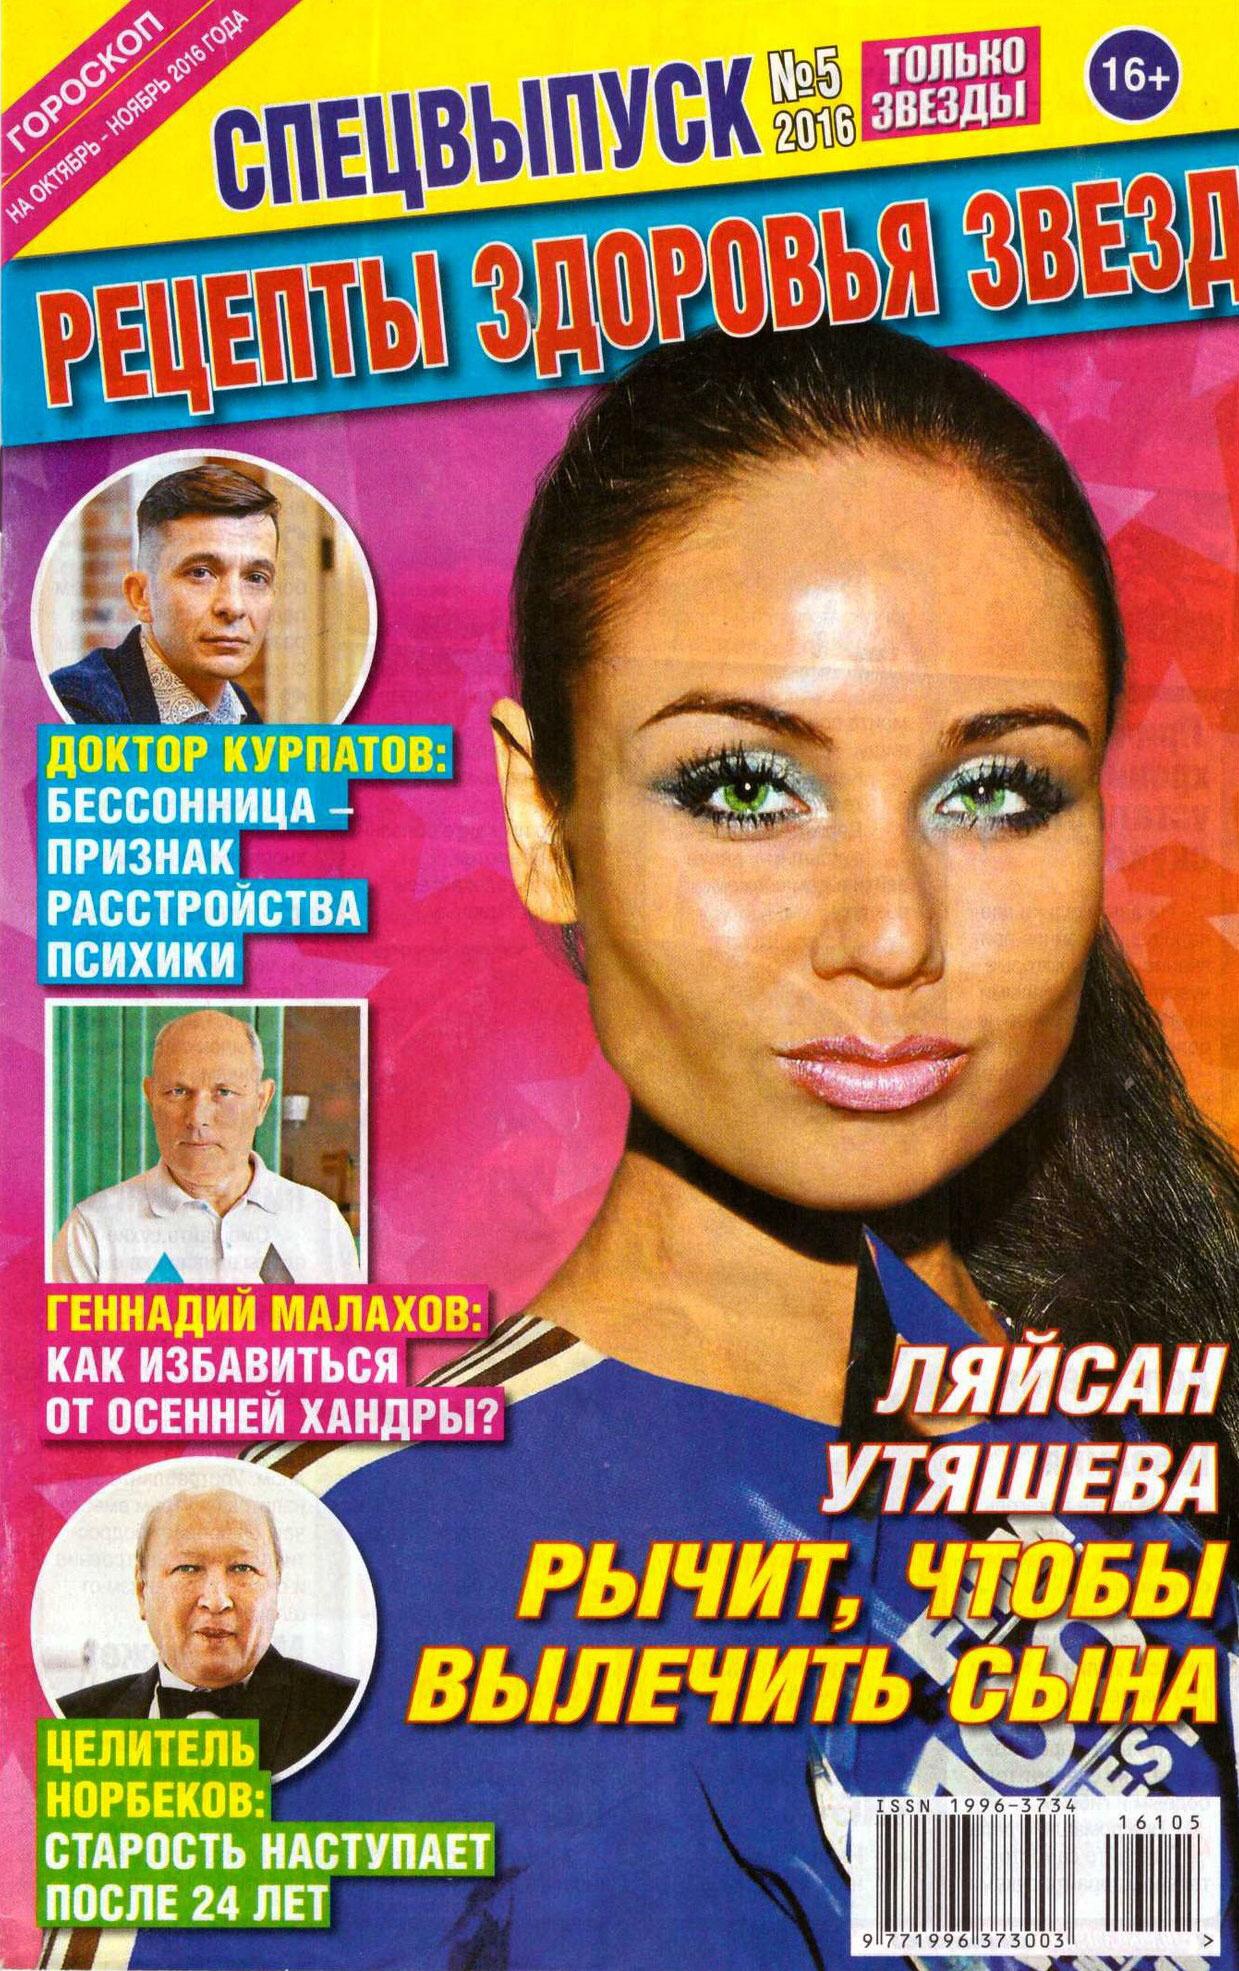 recepti-zdorovia-zvezd-specvipusk-oktyabr-noyabr-2016